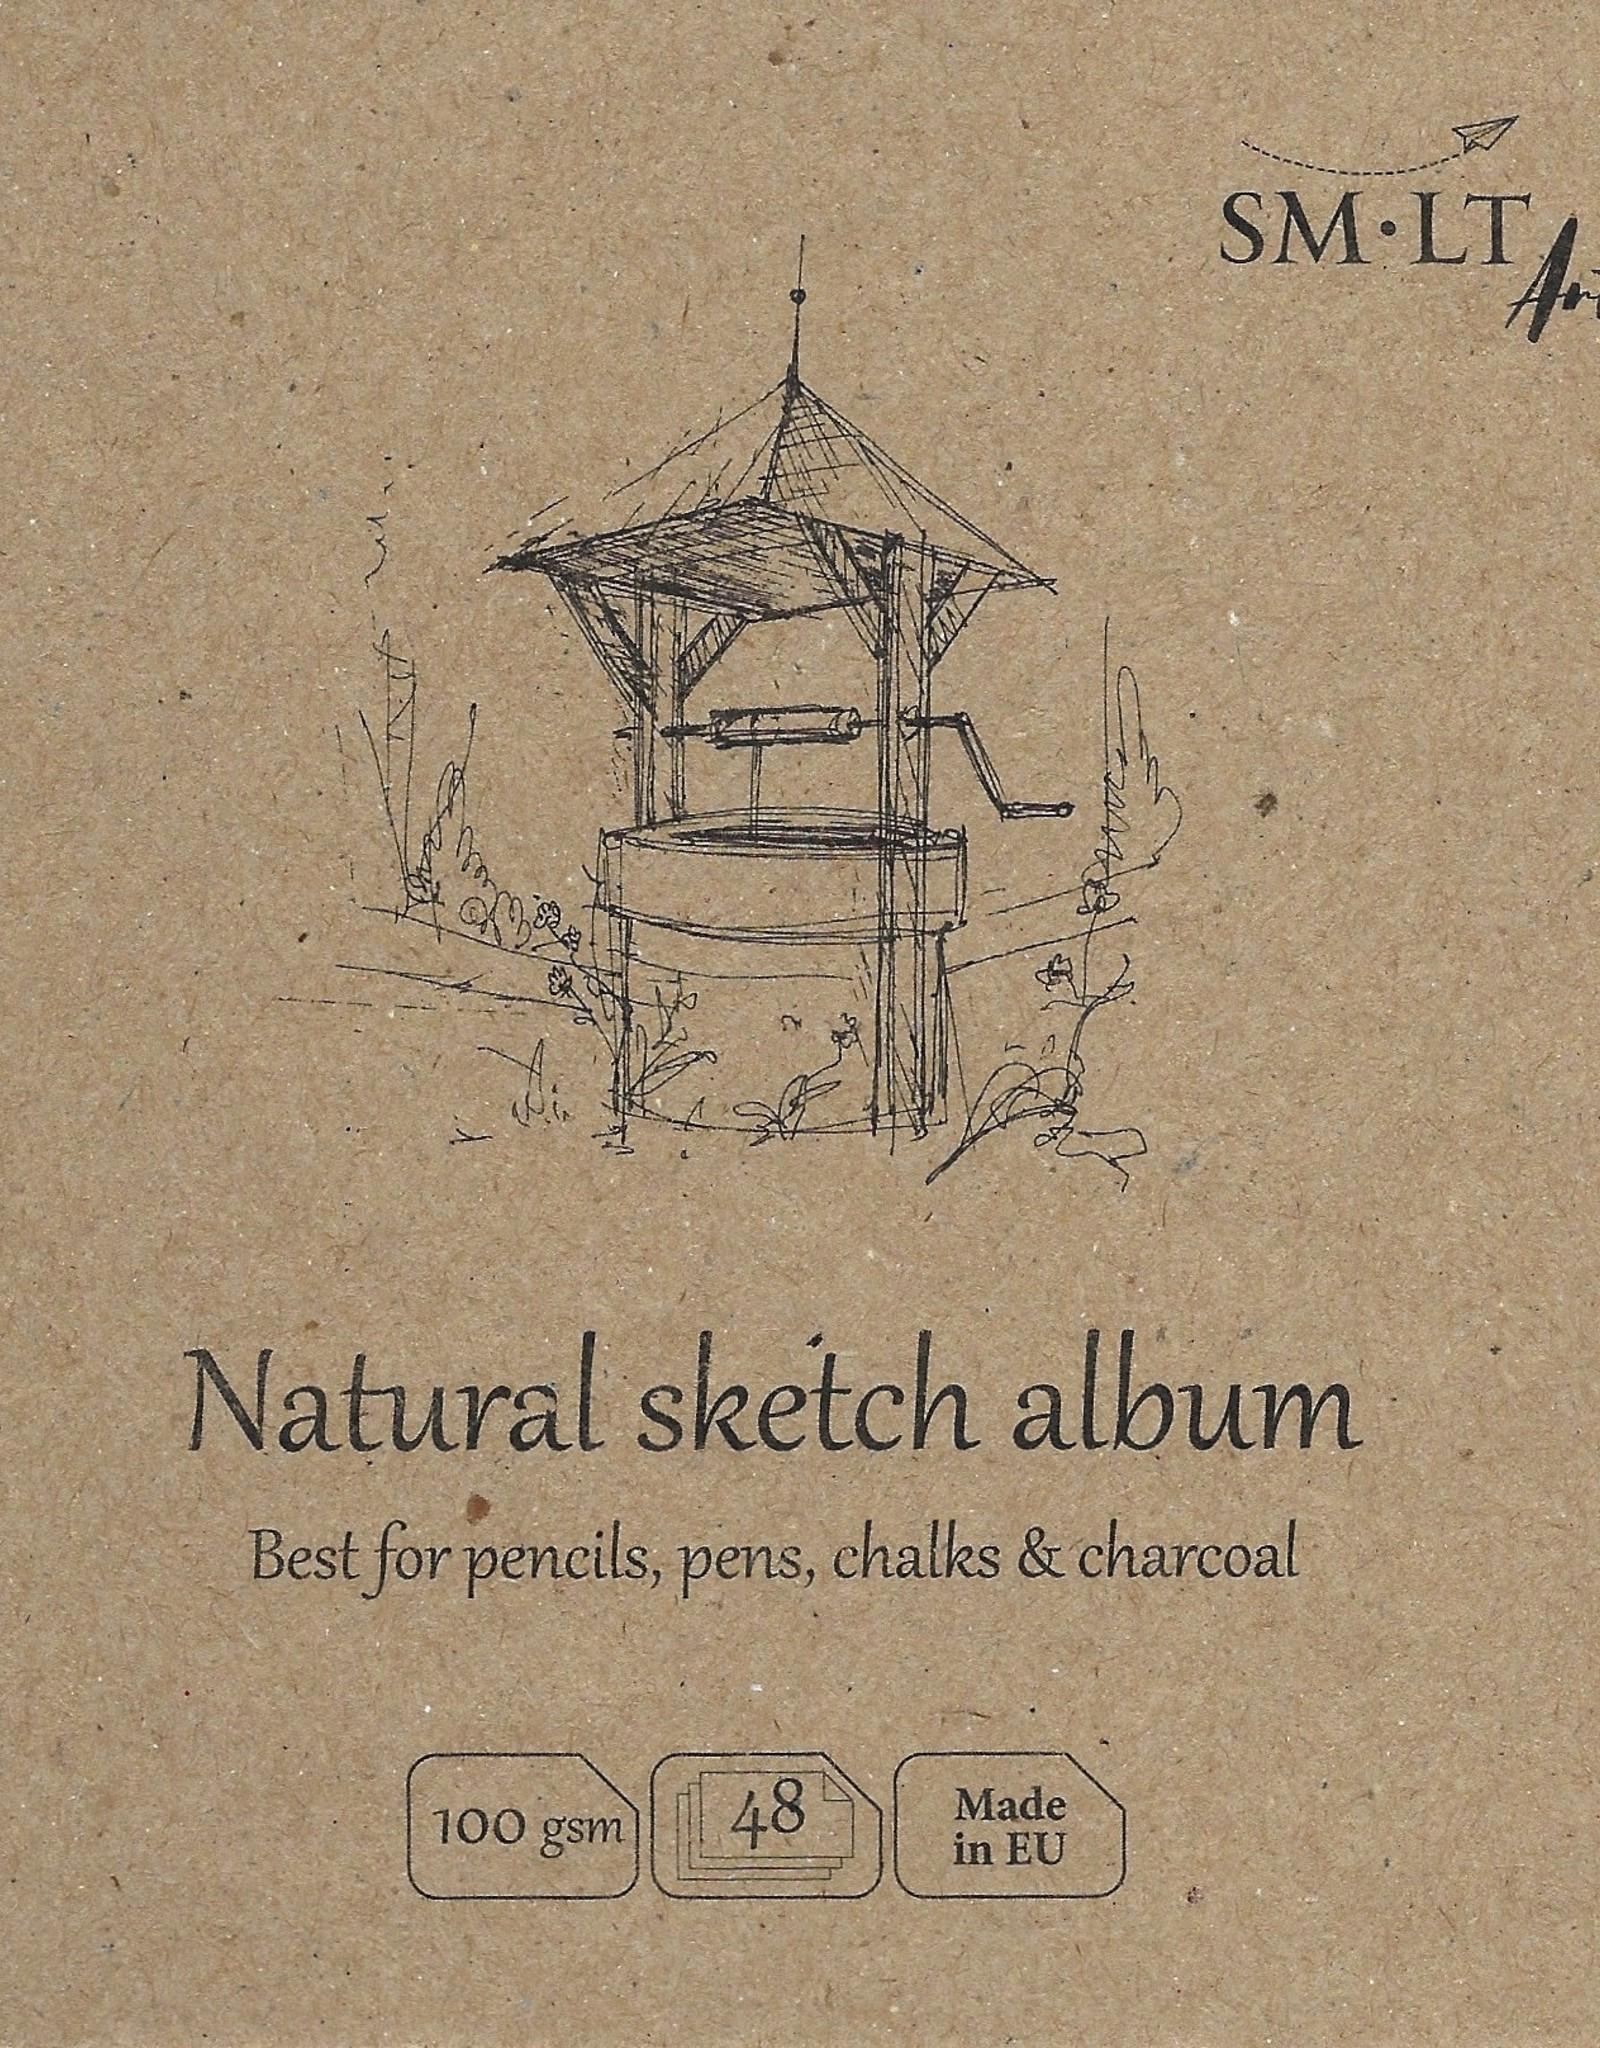 "SMLT Layflat Natural Sketch Album, 5.5"" x 5.5"", 100gsm, 48 Sheets"